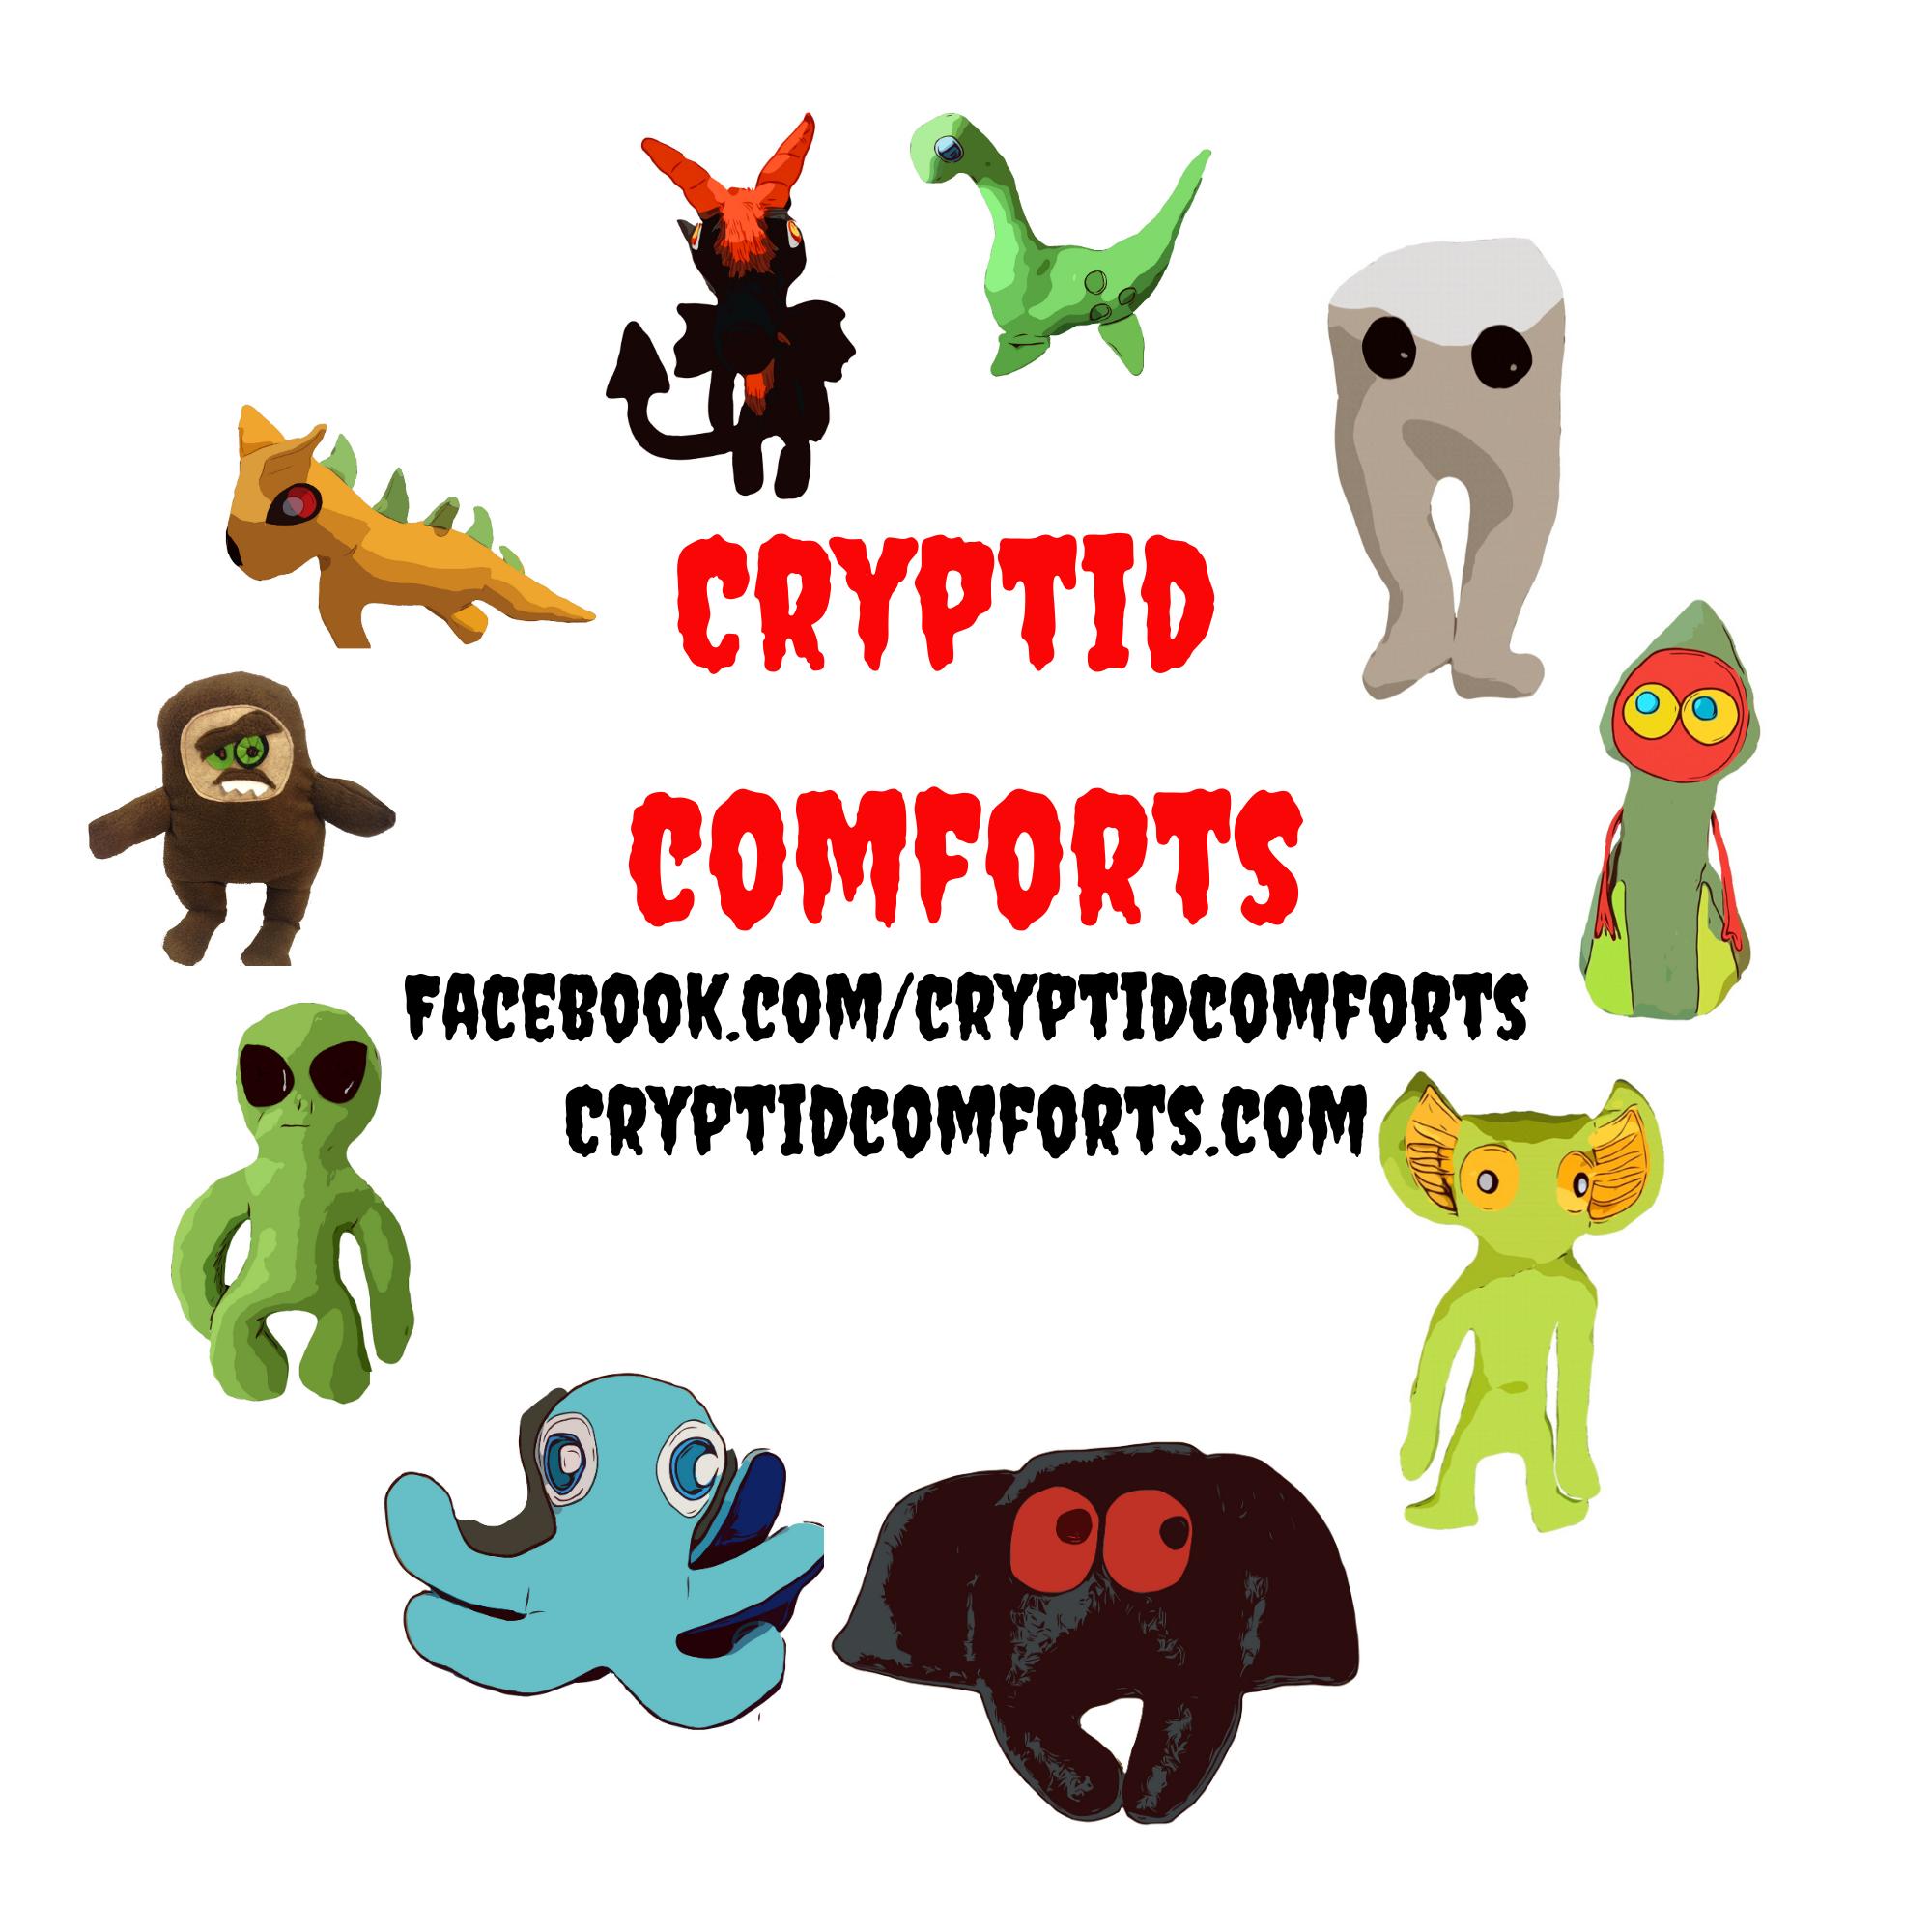 Cryptid Comforts (cryptidcomforts) Profile Image | Linktree